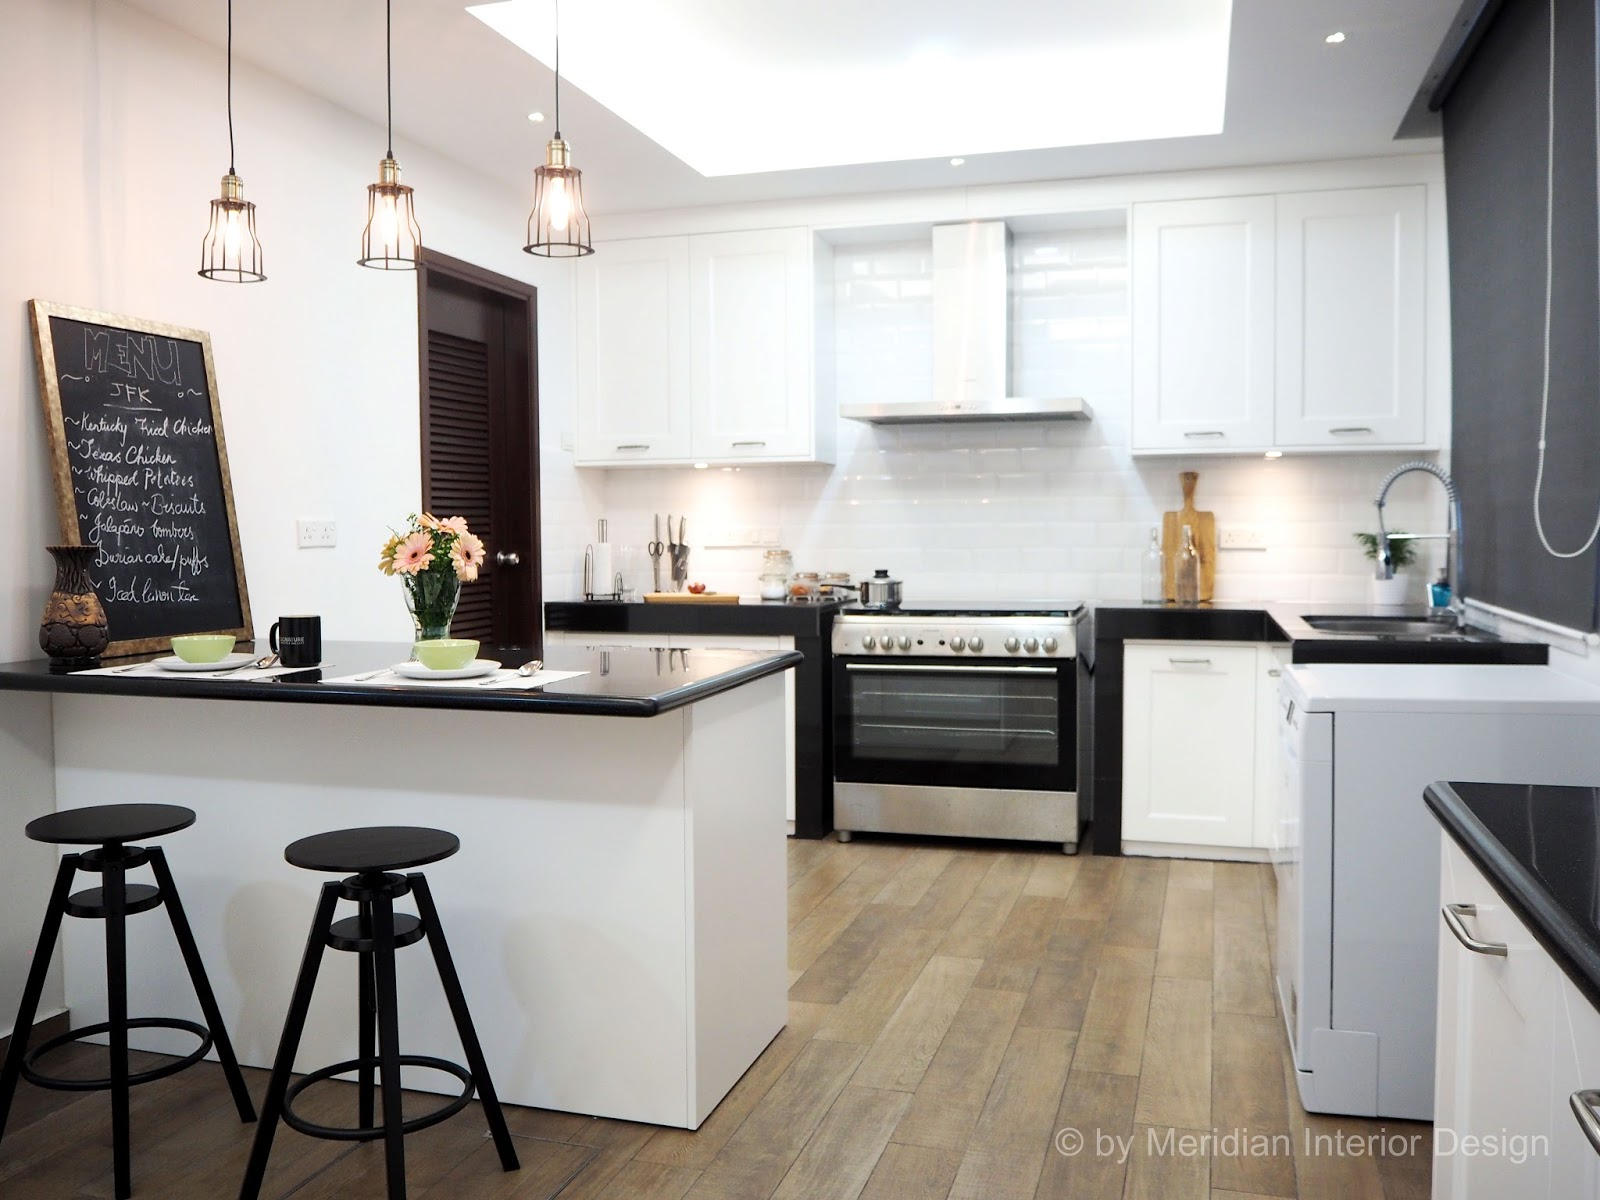 Meridian   Interior Design and Kitchen Design, in Kuala ...